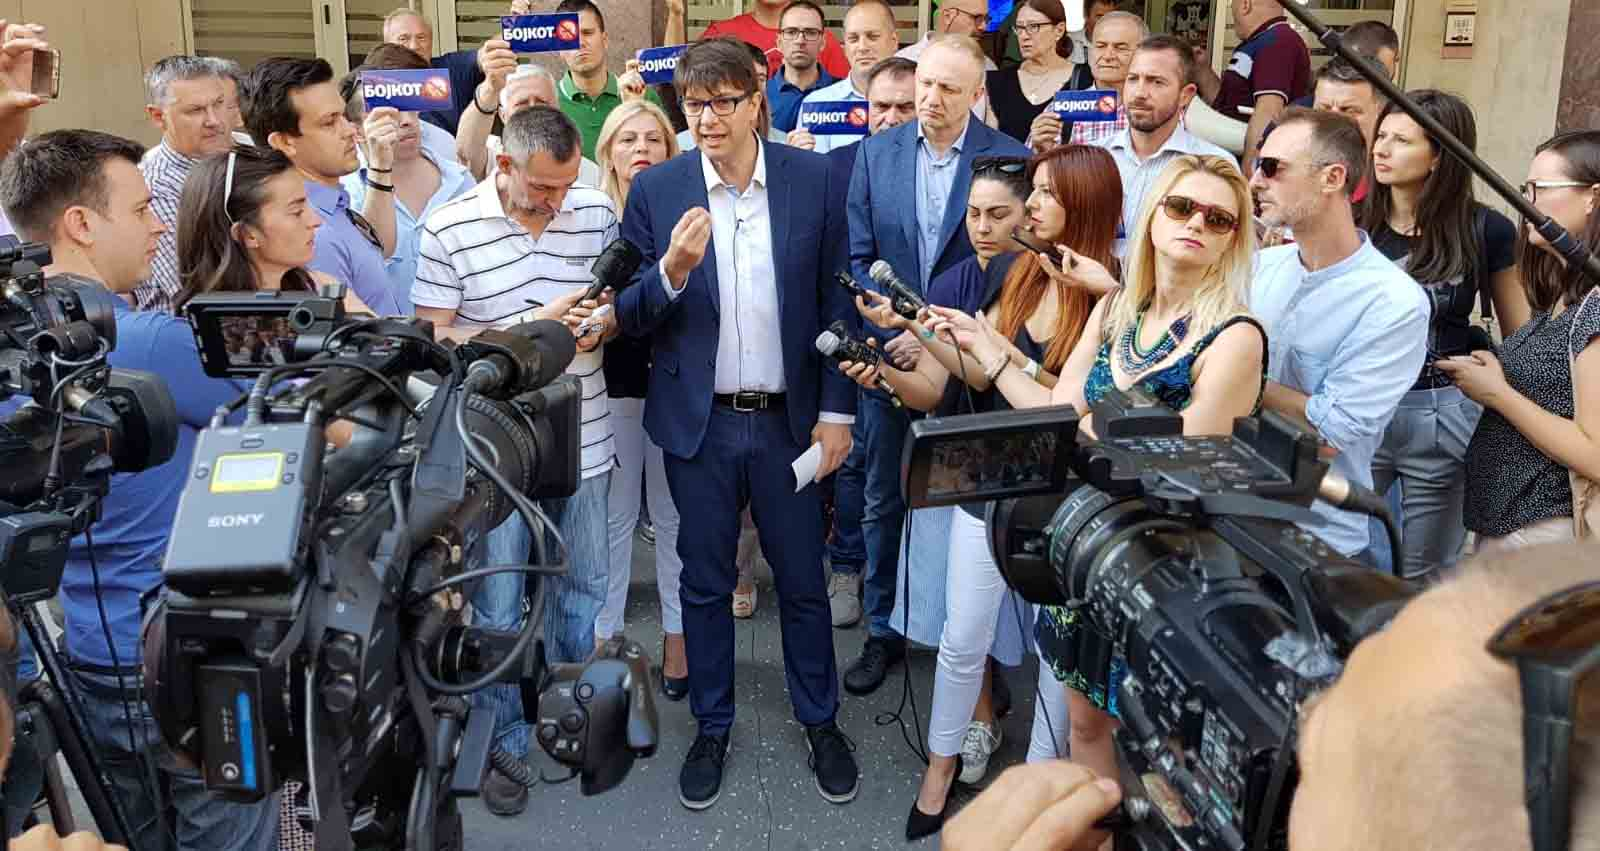 Јовановић: Весић угрожава безбедност Београђана